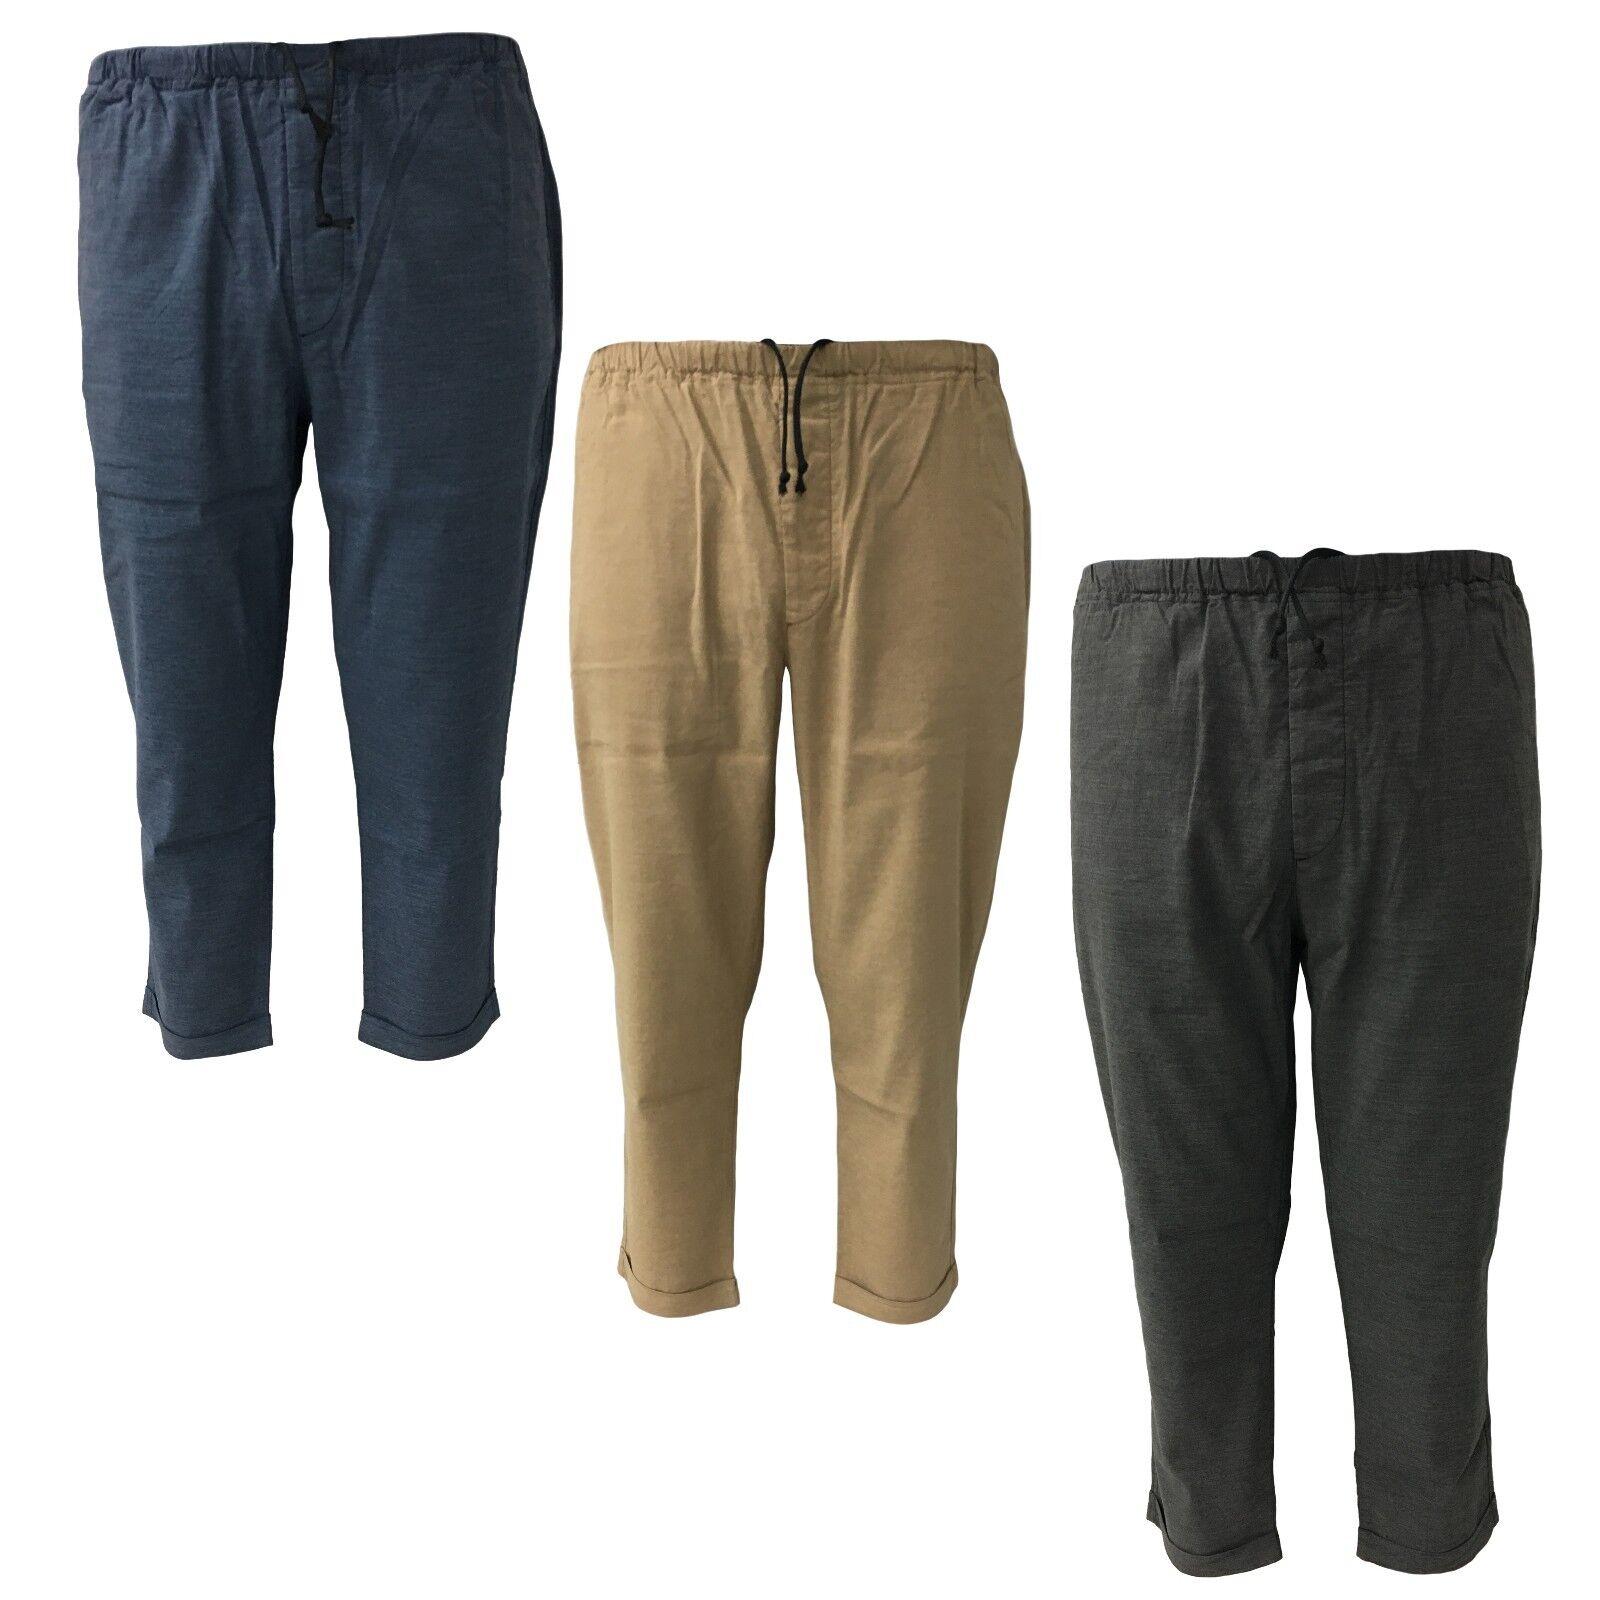 BKØ linea MADSON pantalone uomo uomo uomo lino con elastico mod DU18065 MADE IN ITALY ab4f92